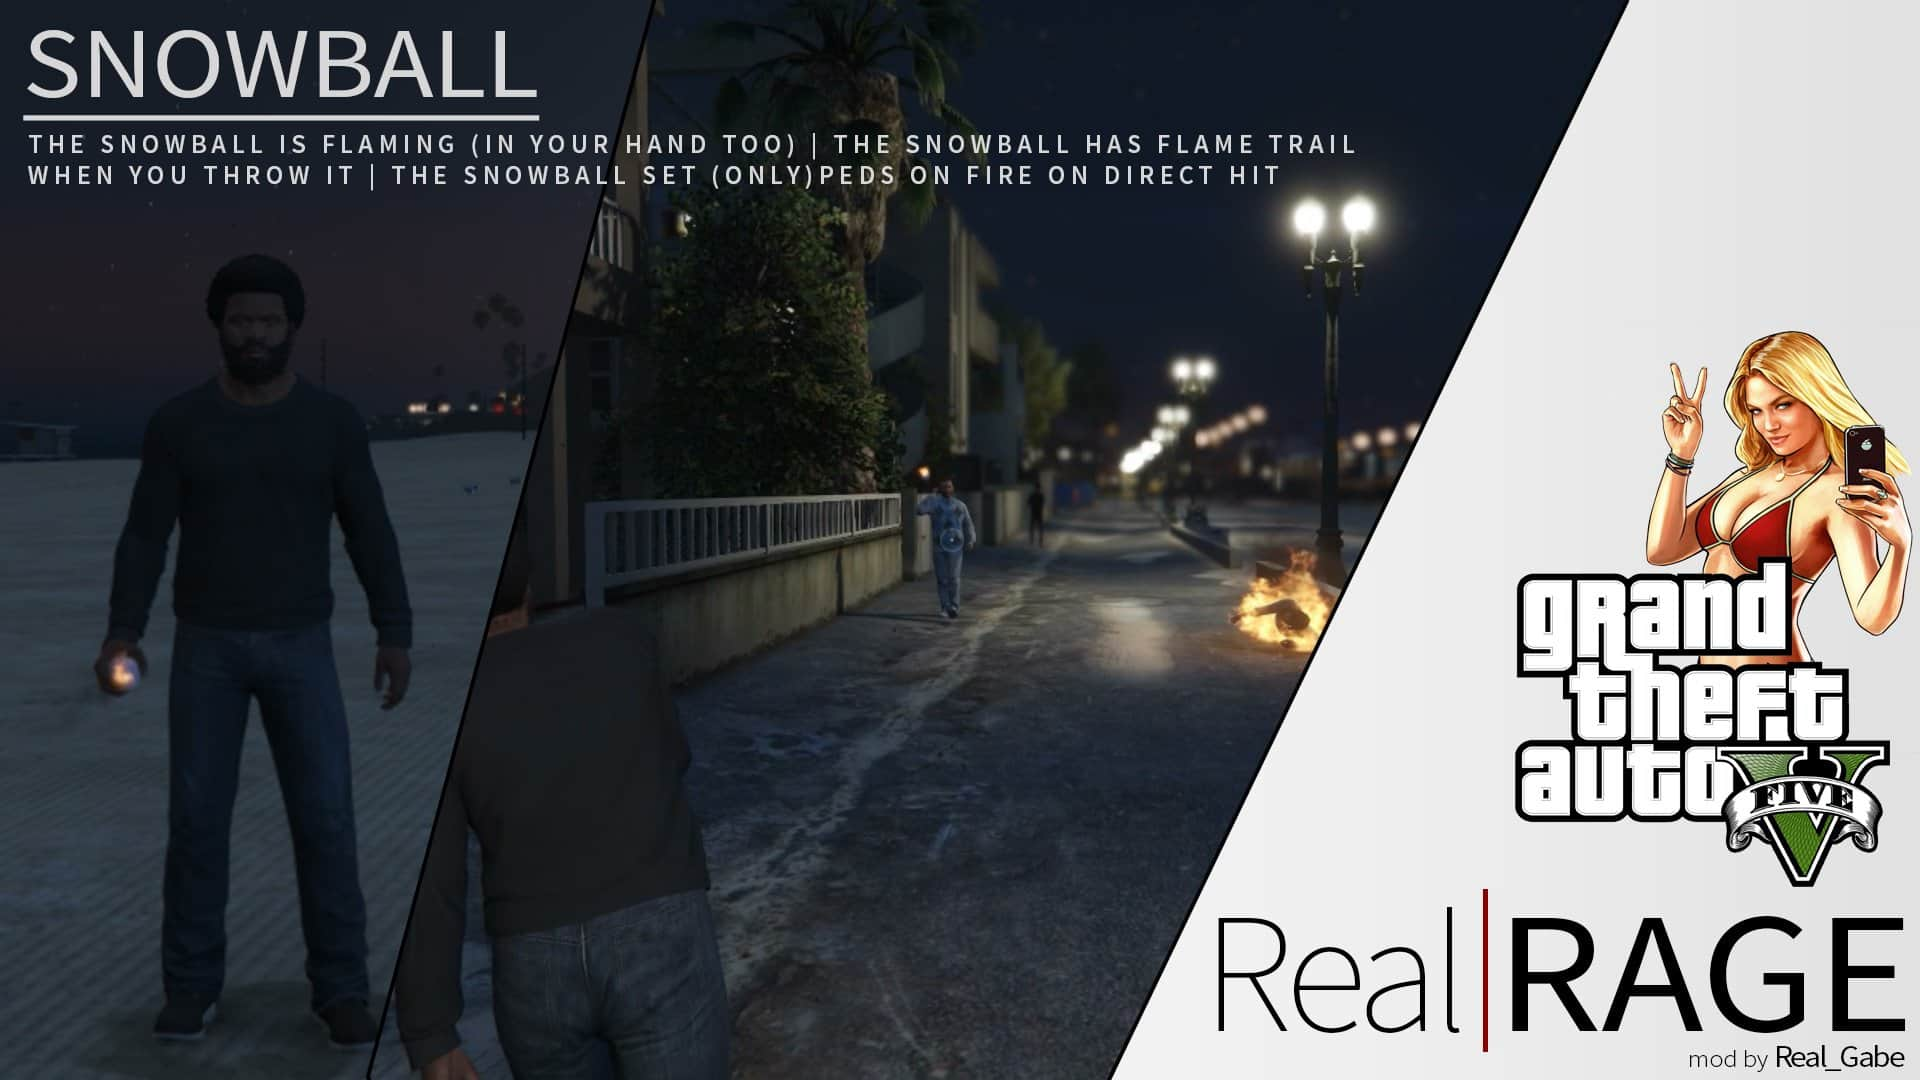 realrage2